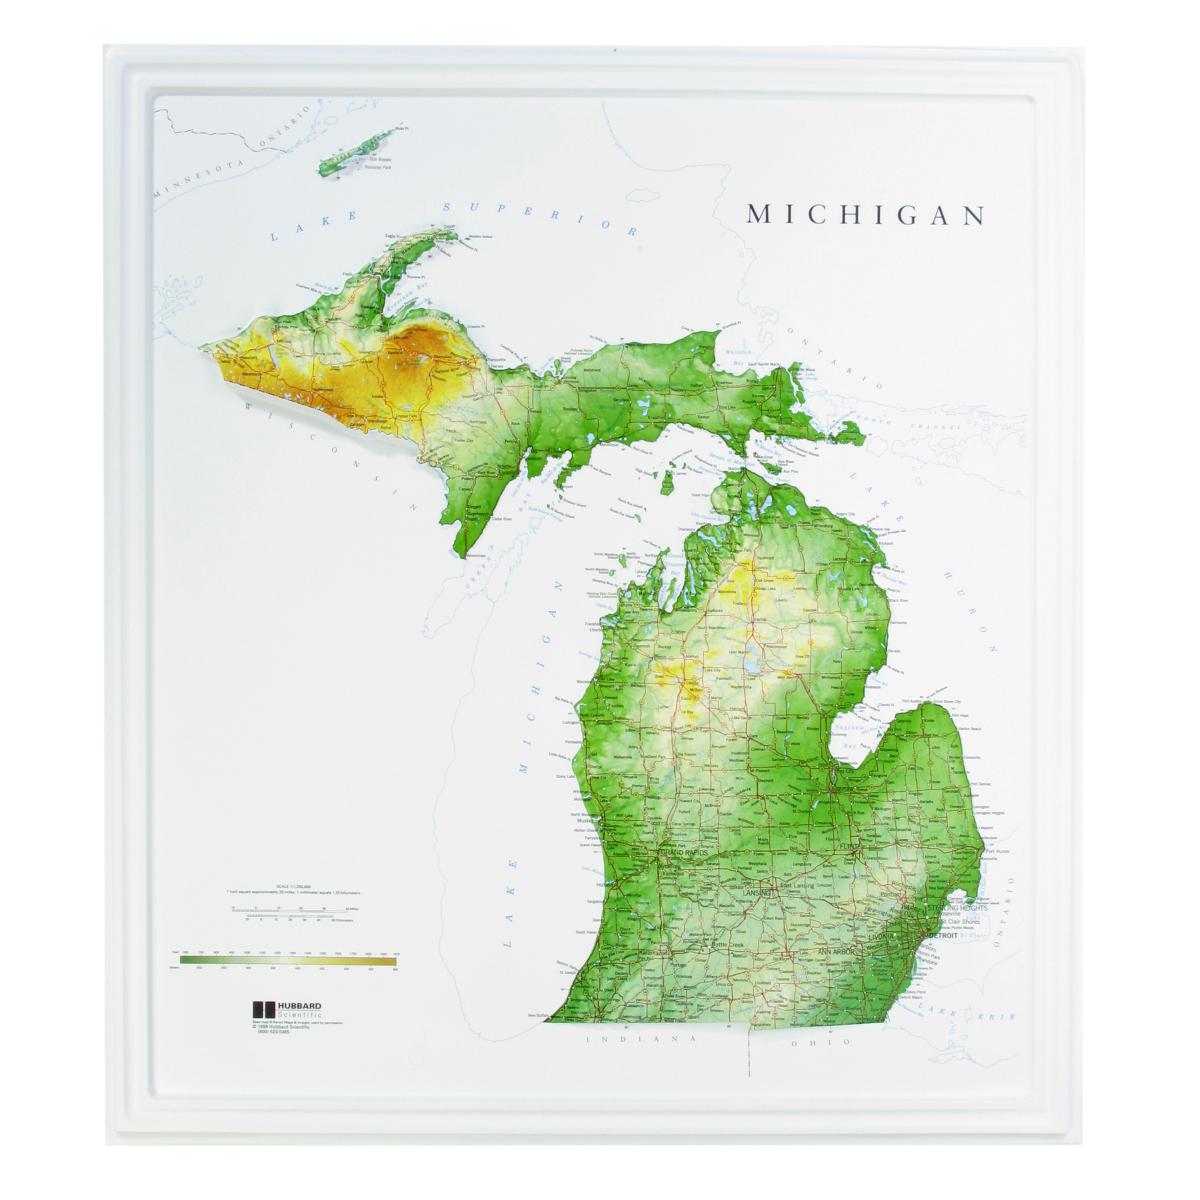 Hubbard Scientific Raised Relief Map Michigan State